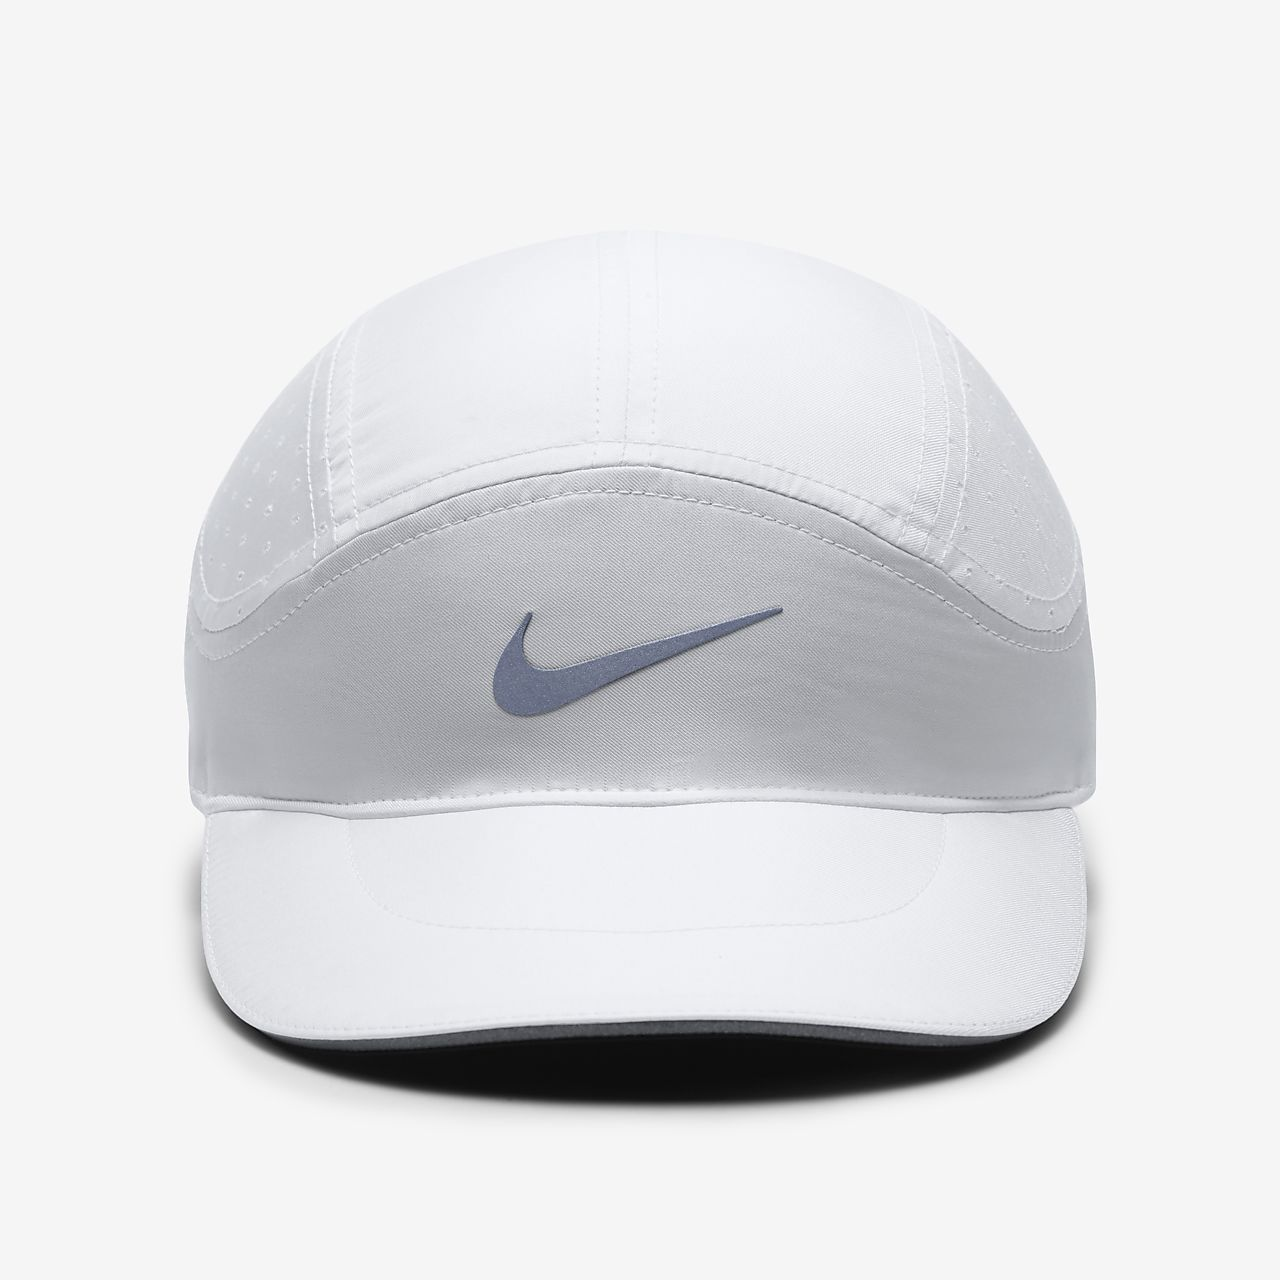 321ea5b9e86 Nike AeroBill Running Hat. Nike.com